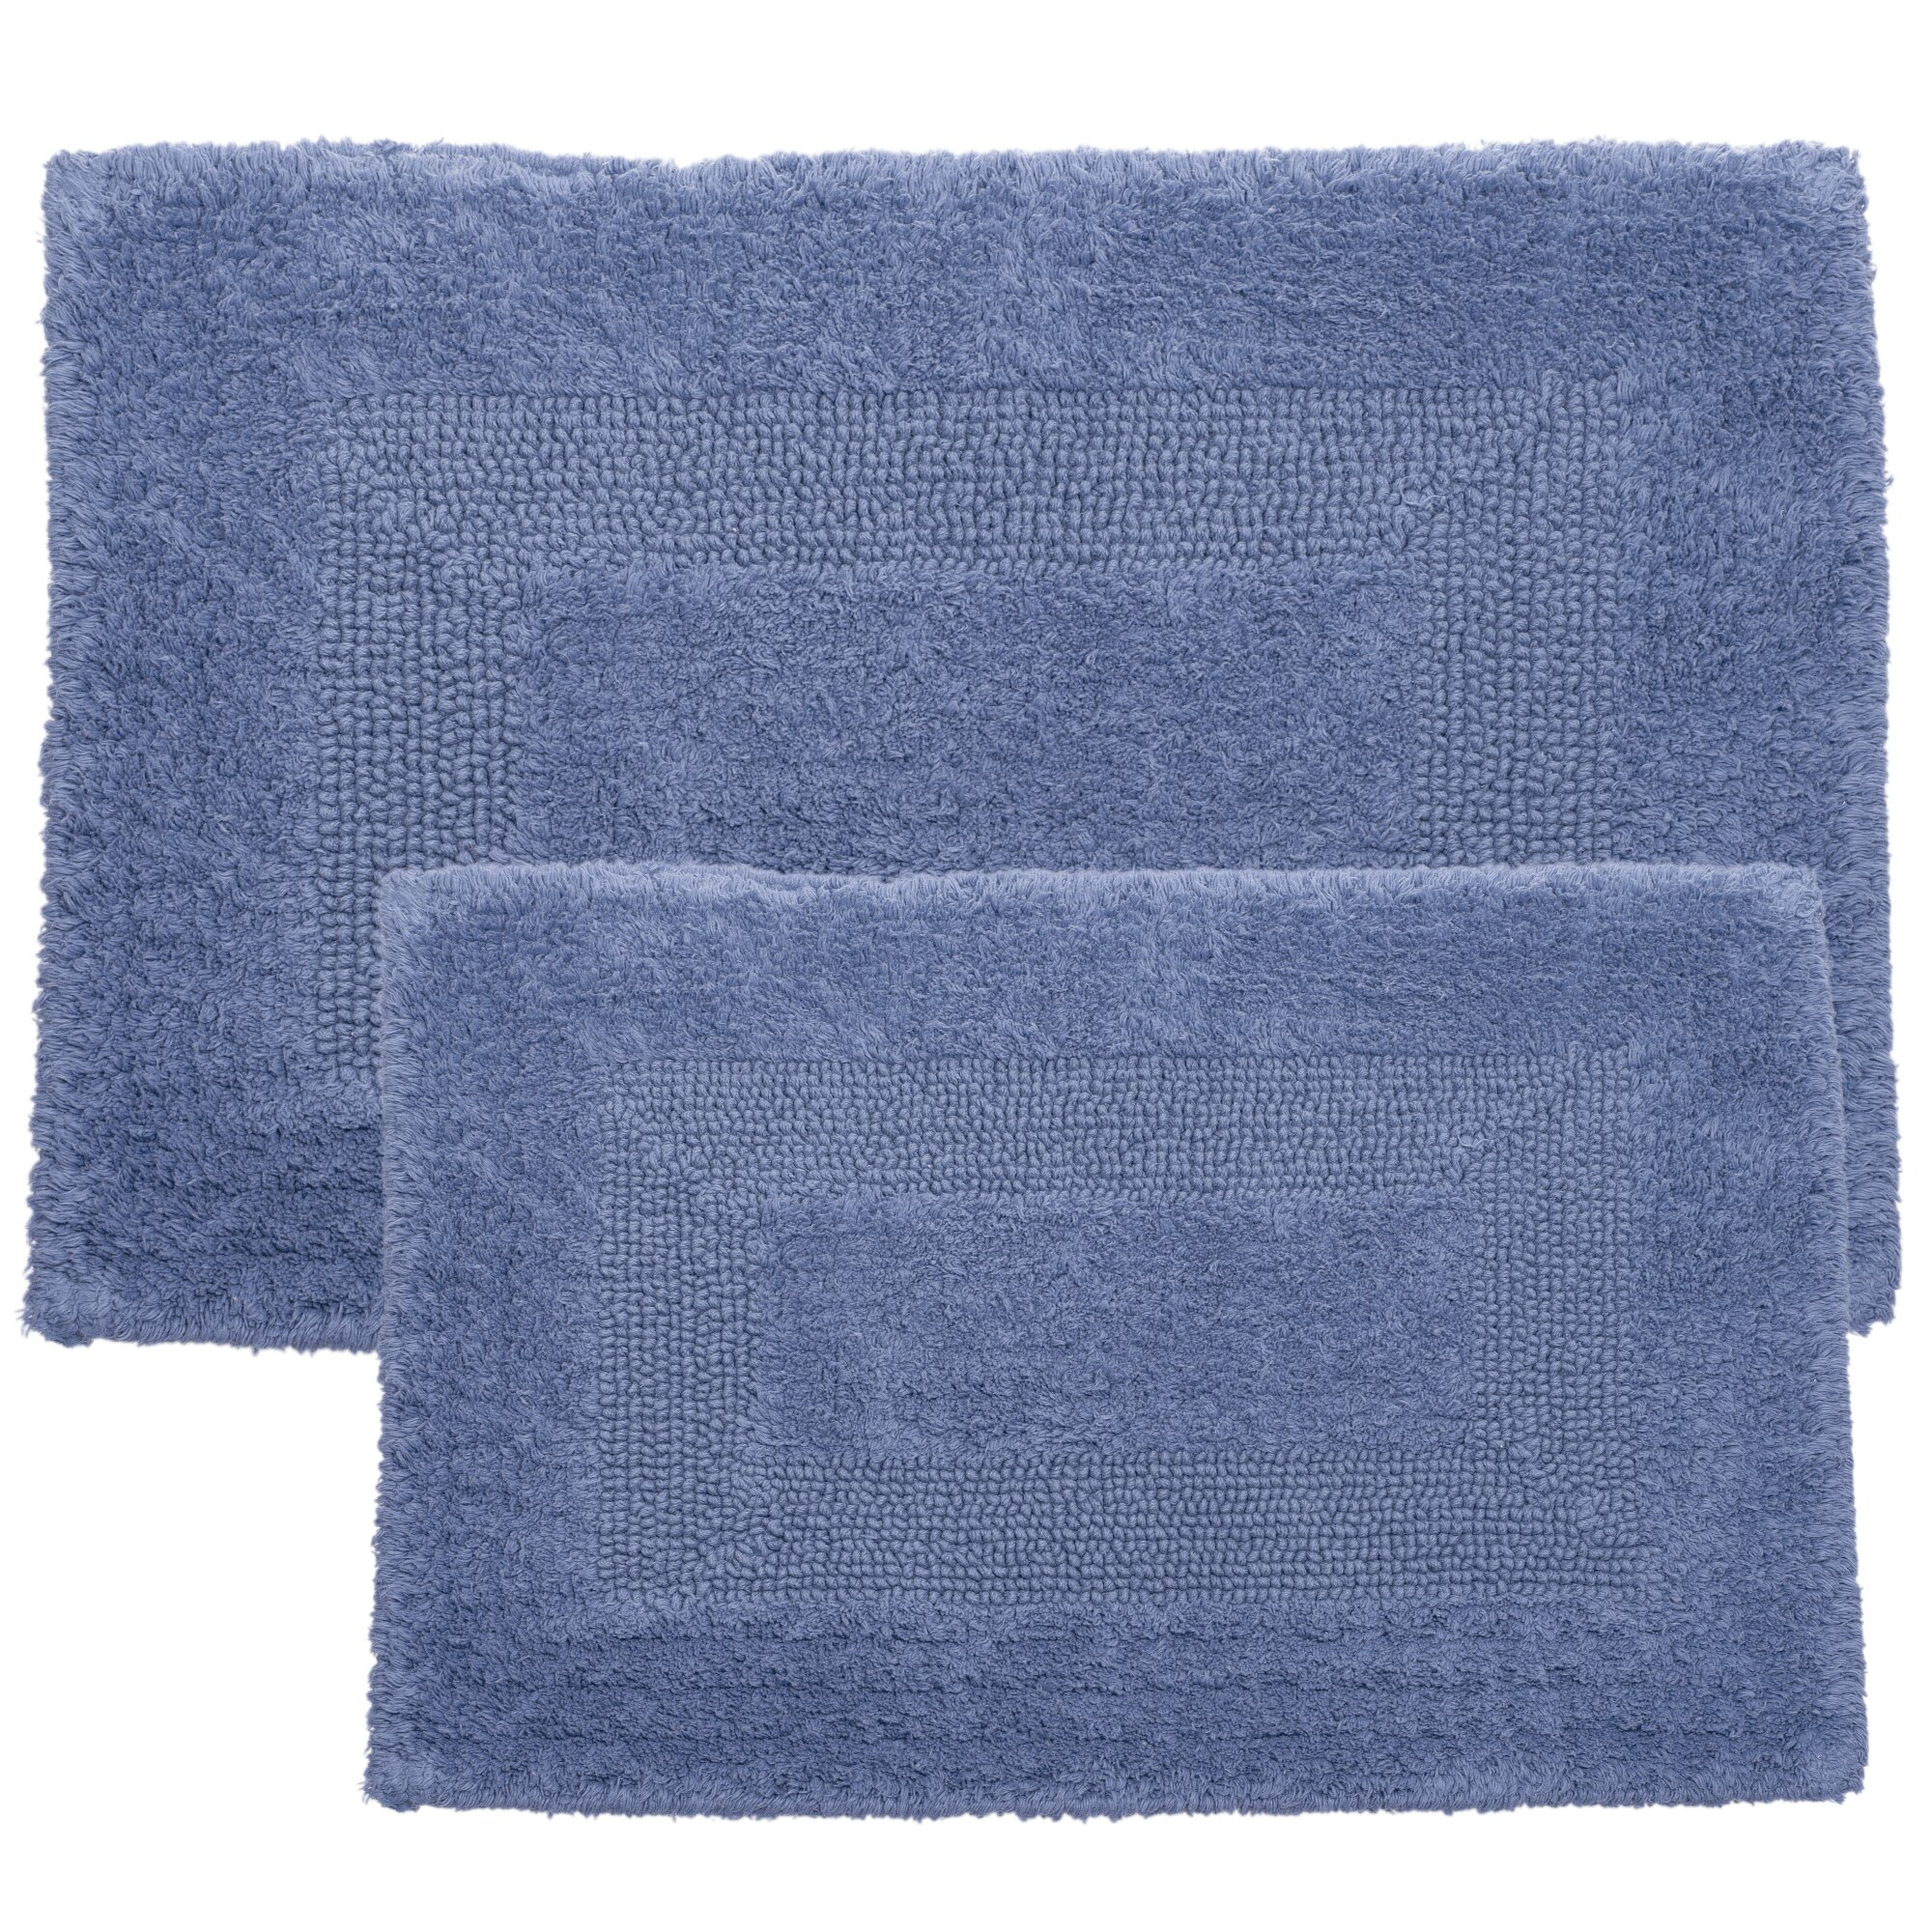 Lavish Home 2 Piece Reversible Bath Rug Set & Reviews